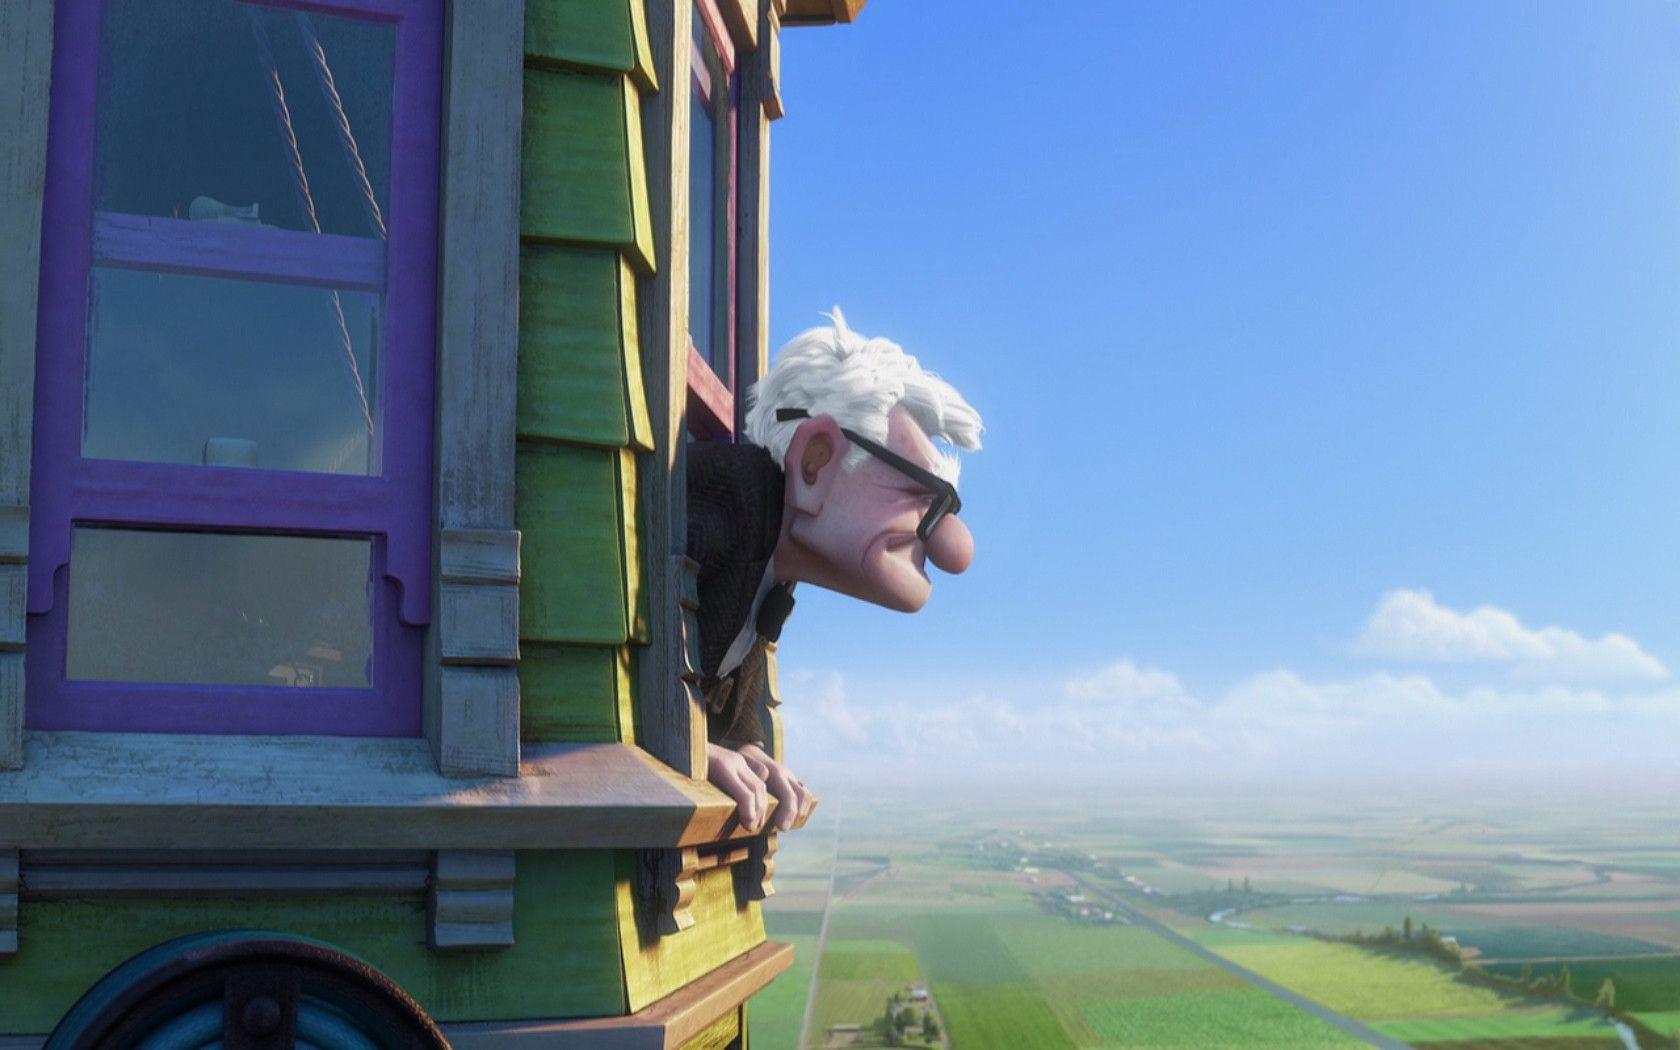 Pixar Cars Wallpaper Up Wallpapers Pixar Wallpaper Cave